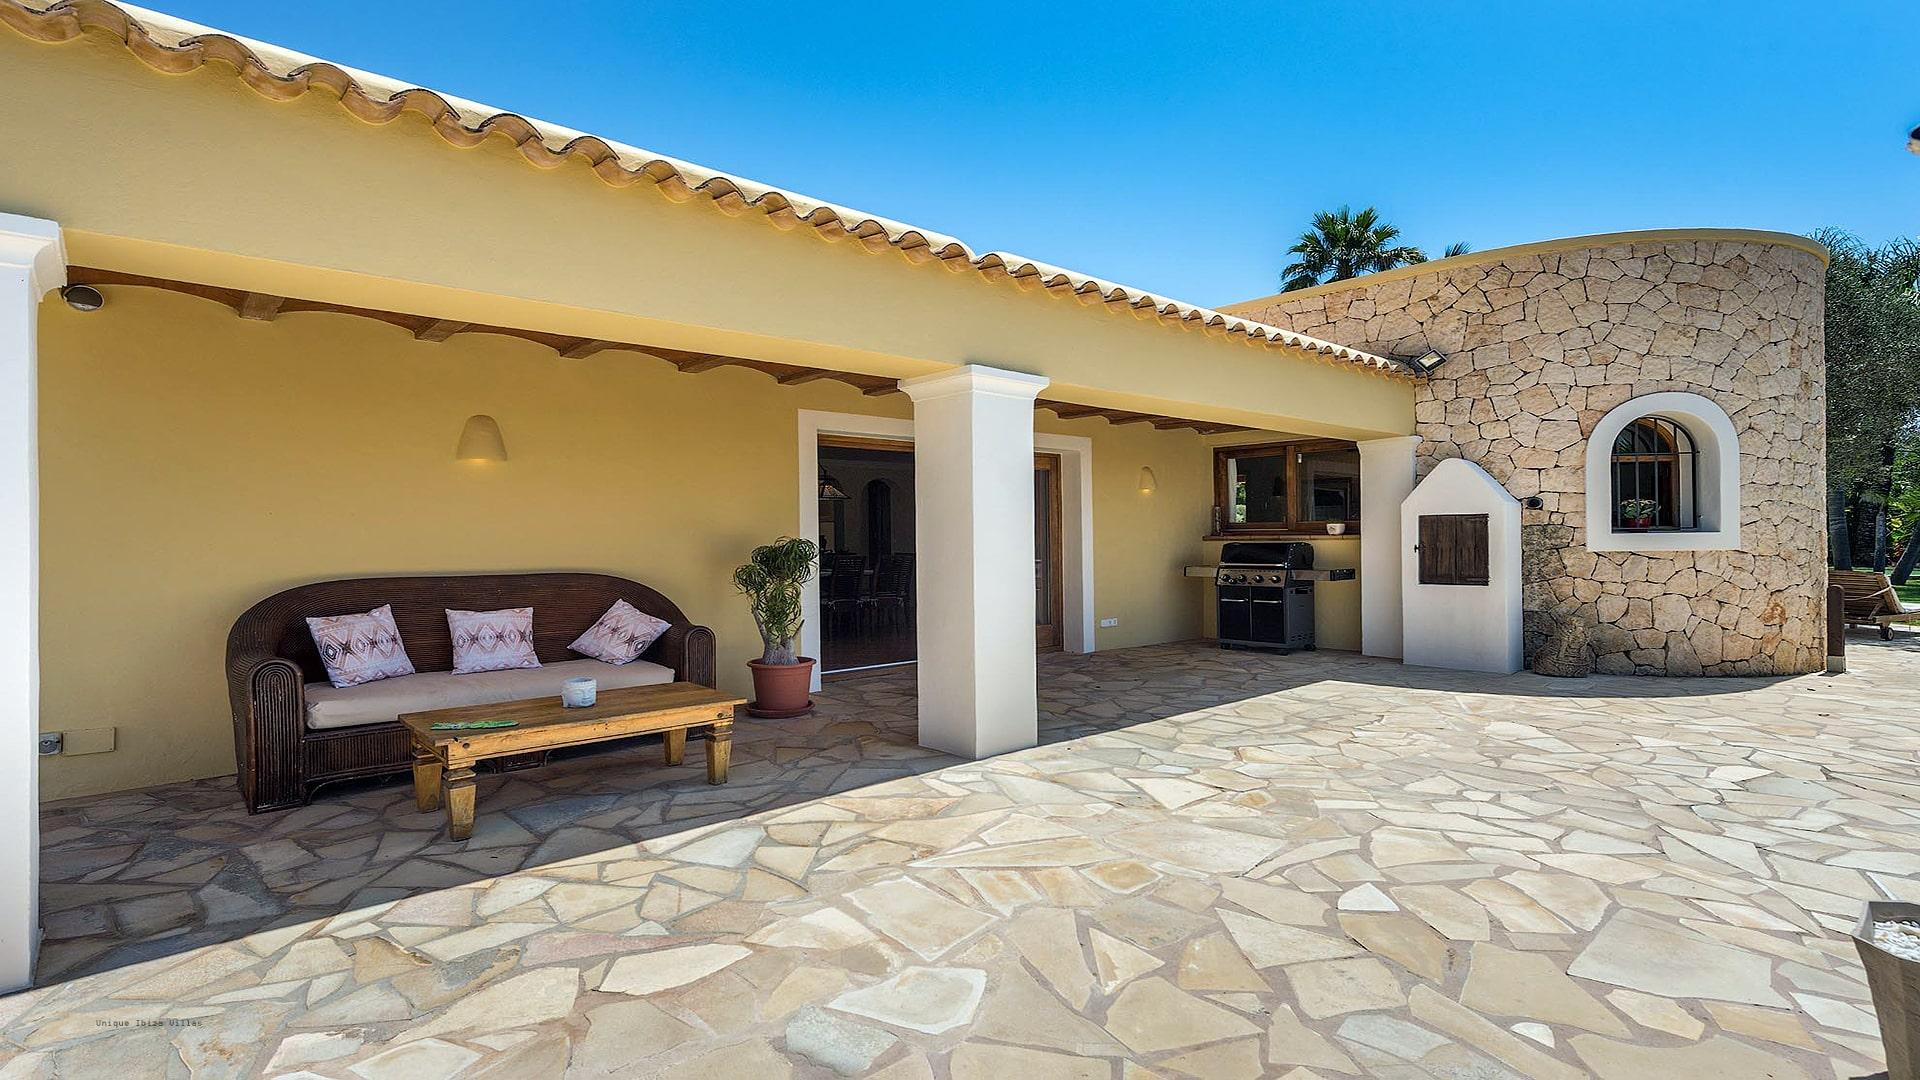 Casa Beni Ibiza 21 Santa Eulalia